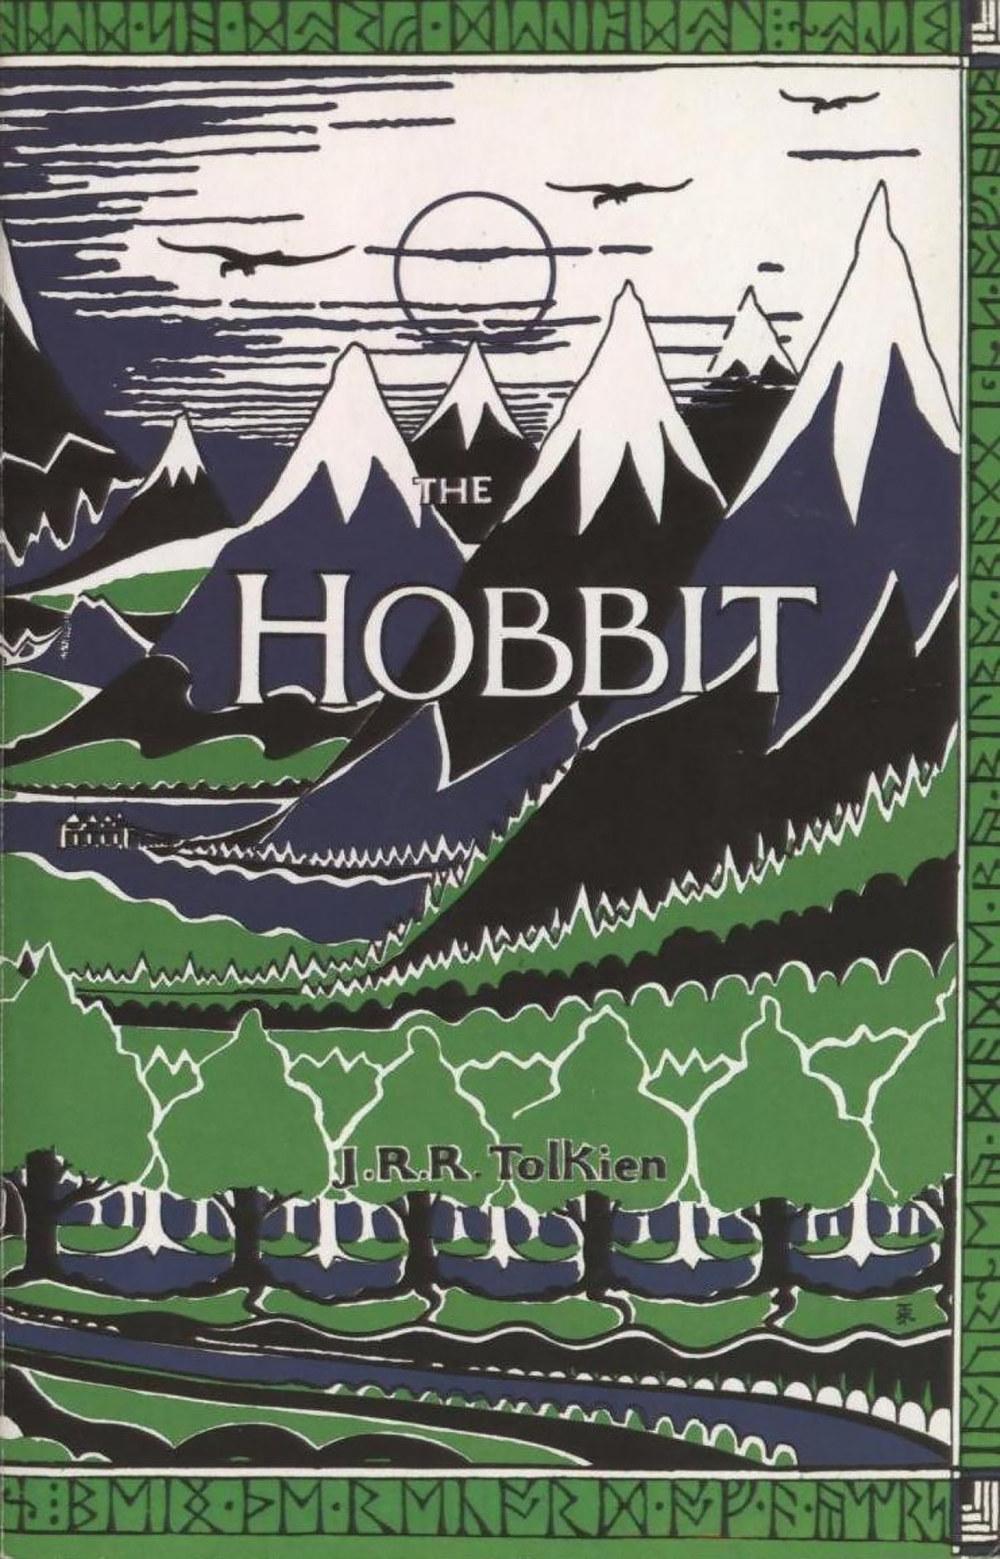 hobbitcover.jpg